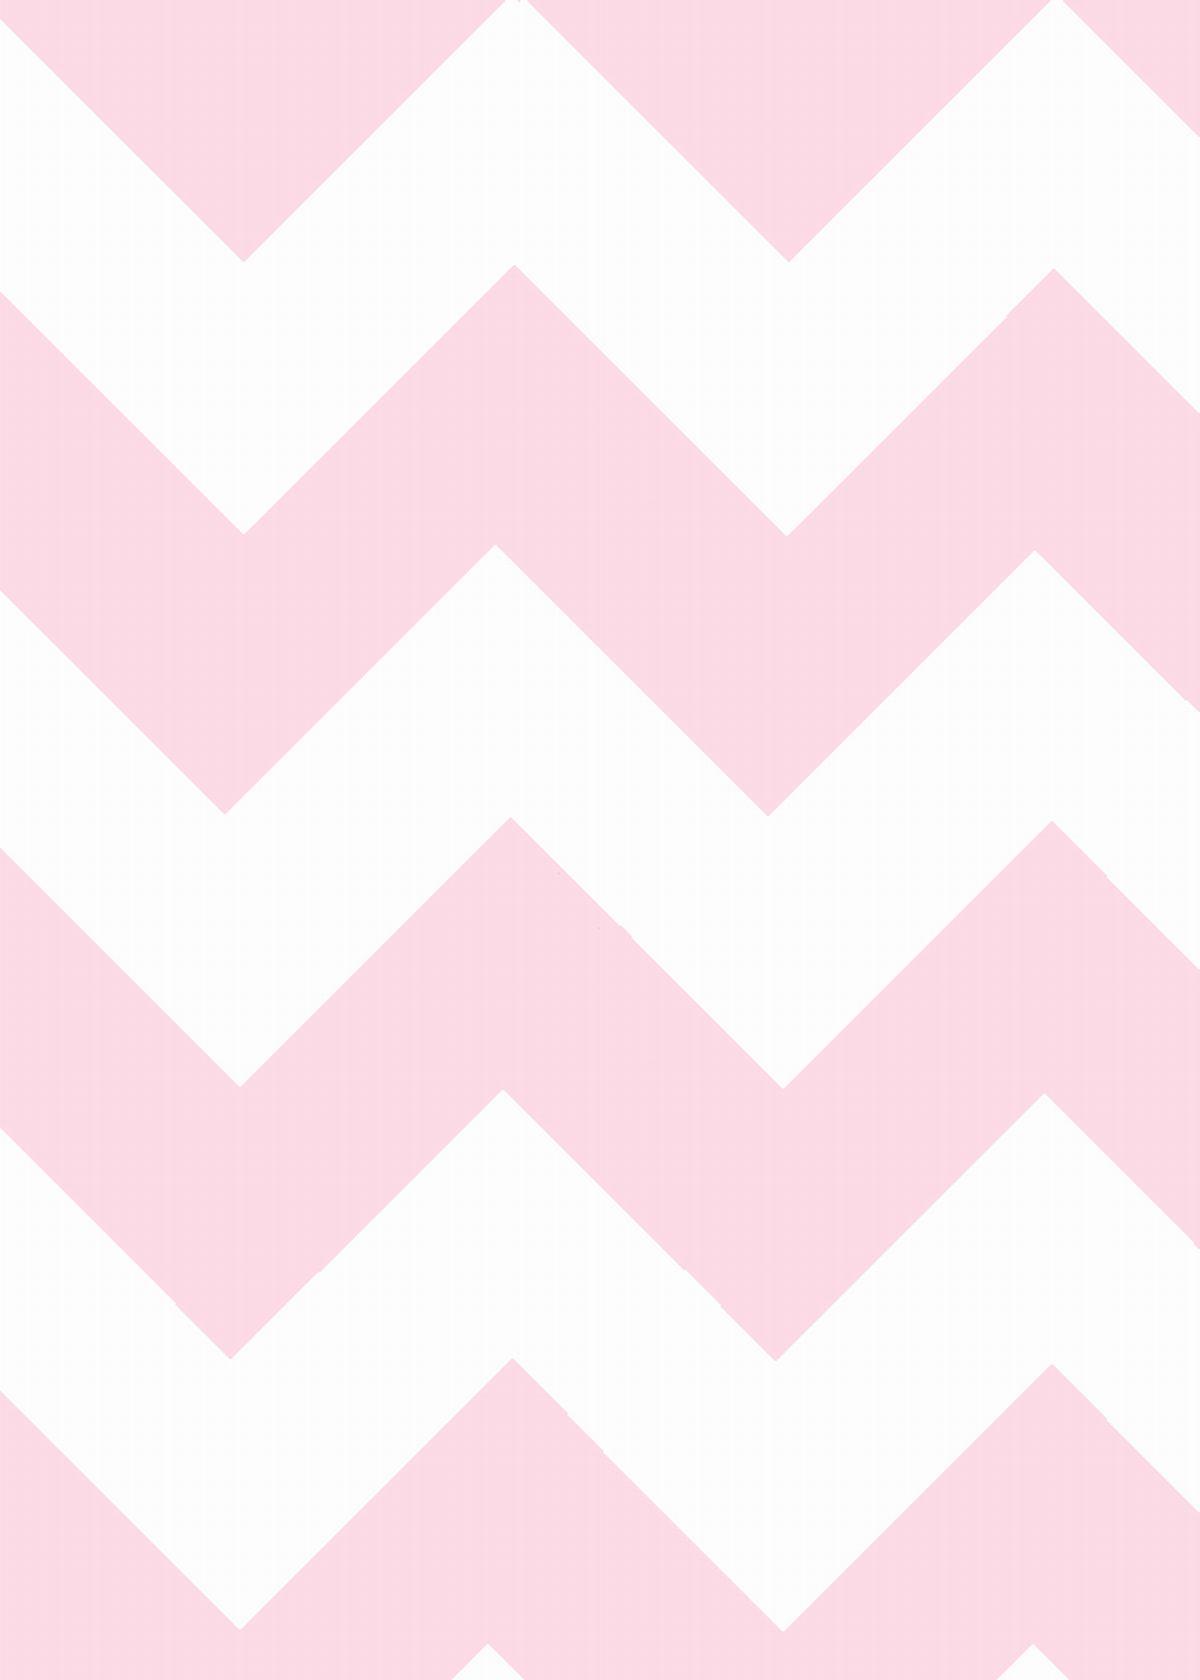 Iphone wallpapers tumblr chevron - Iphone Wallpaper Pink Chevron Wallpaperchevron Backgroundsiphone